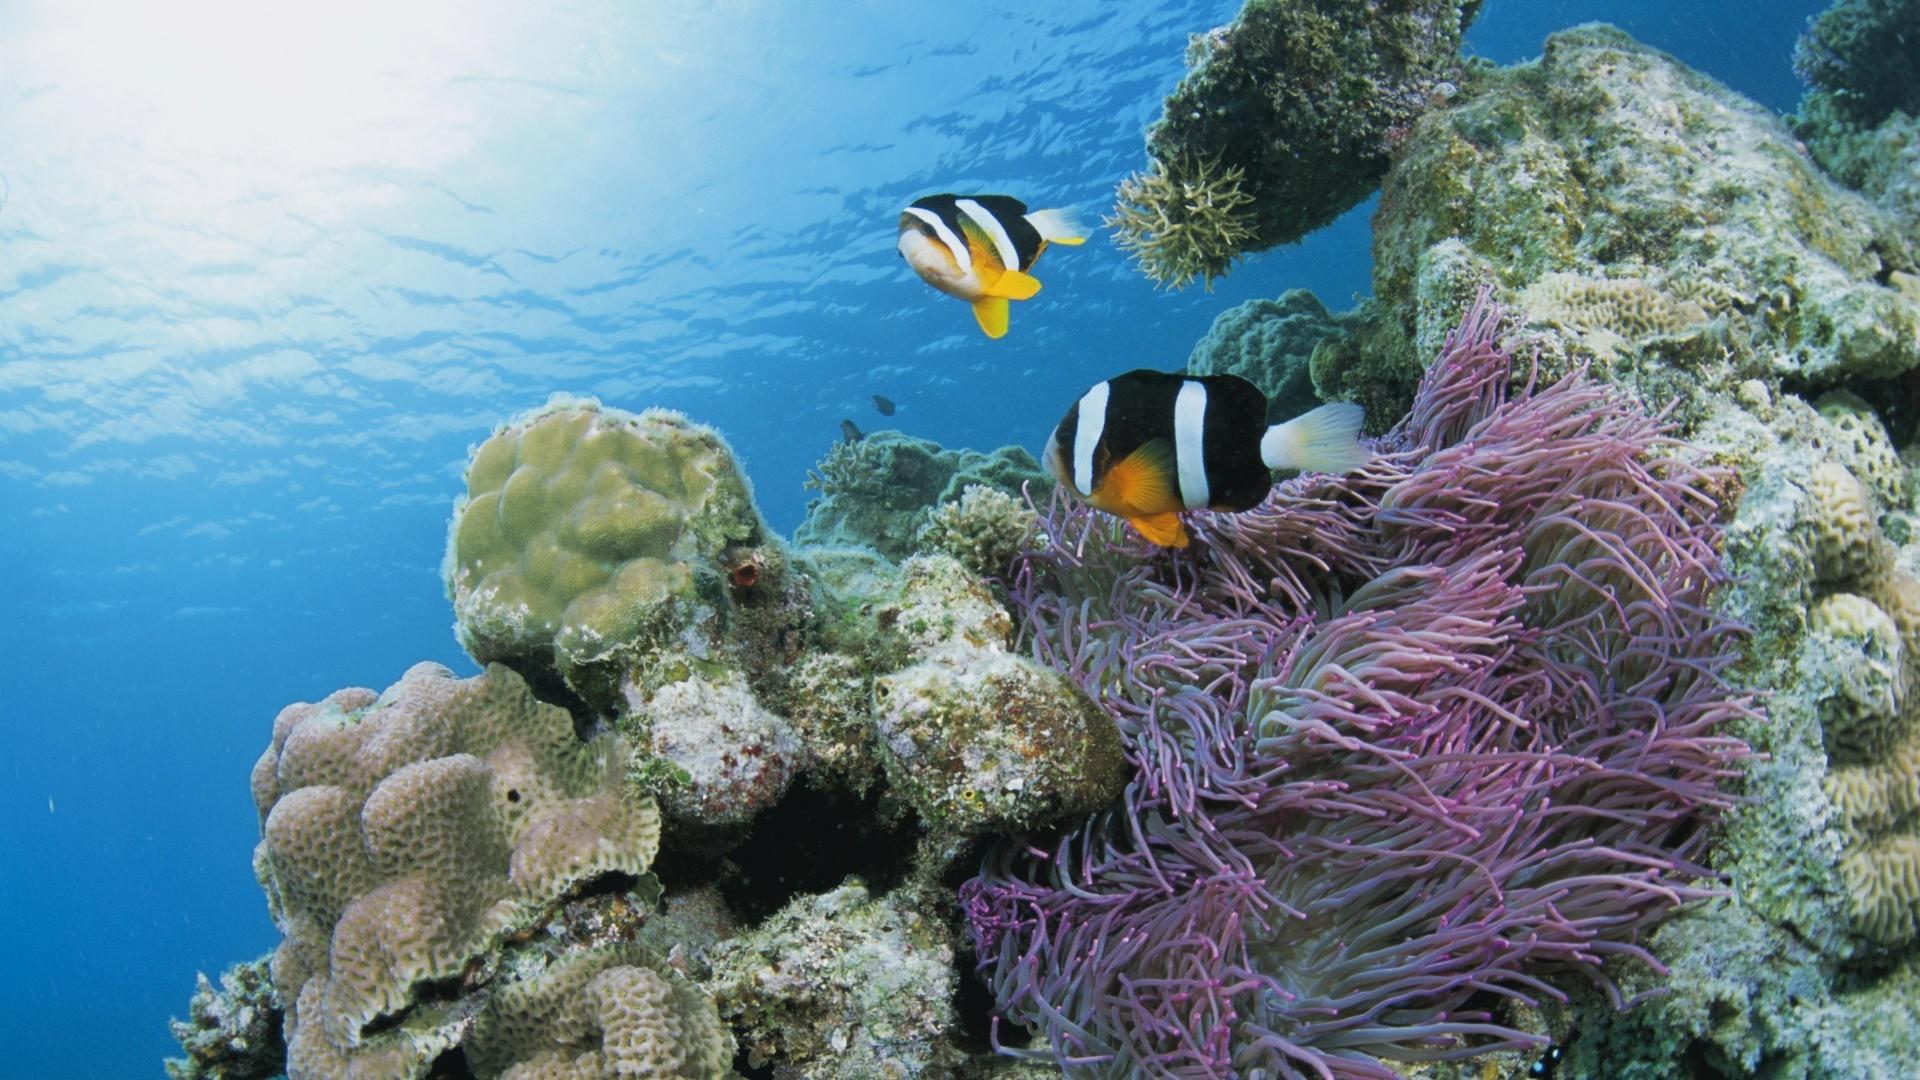 Coral Reefs – Coral World Water Sea Beautiful Underwater Ocean Reef  Wallpaper Hd for HD 16